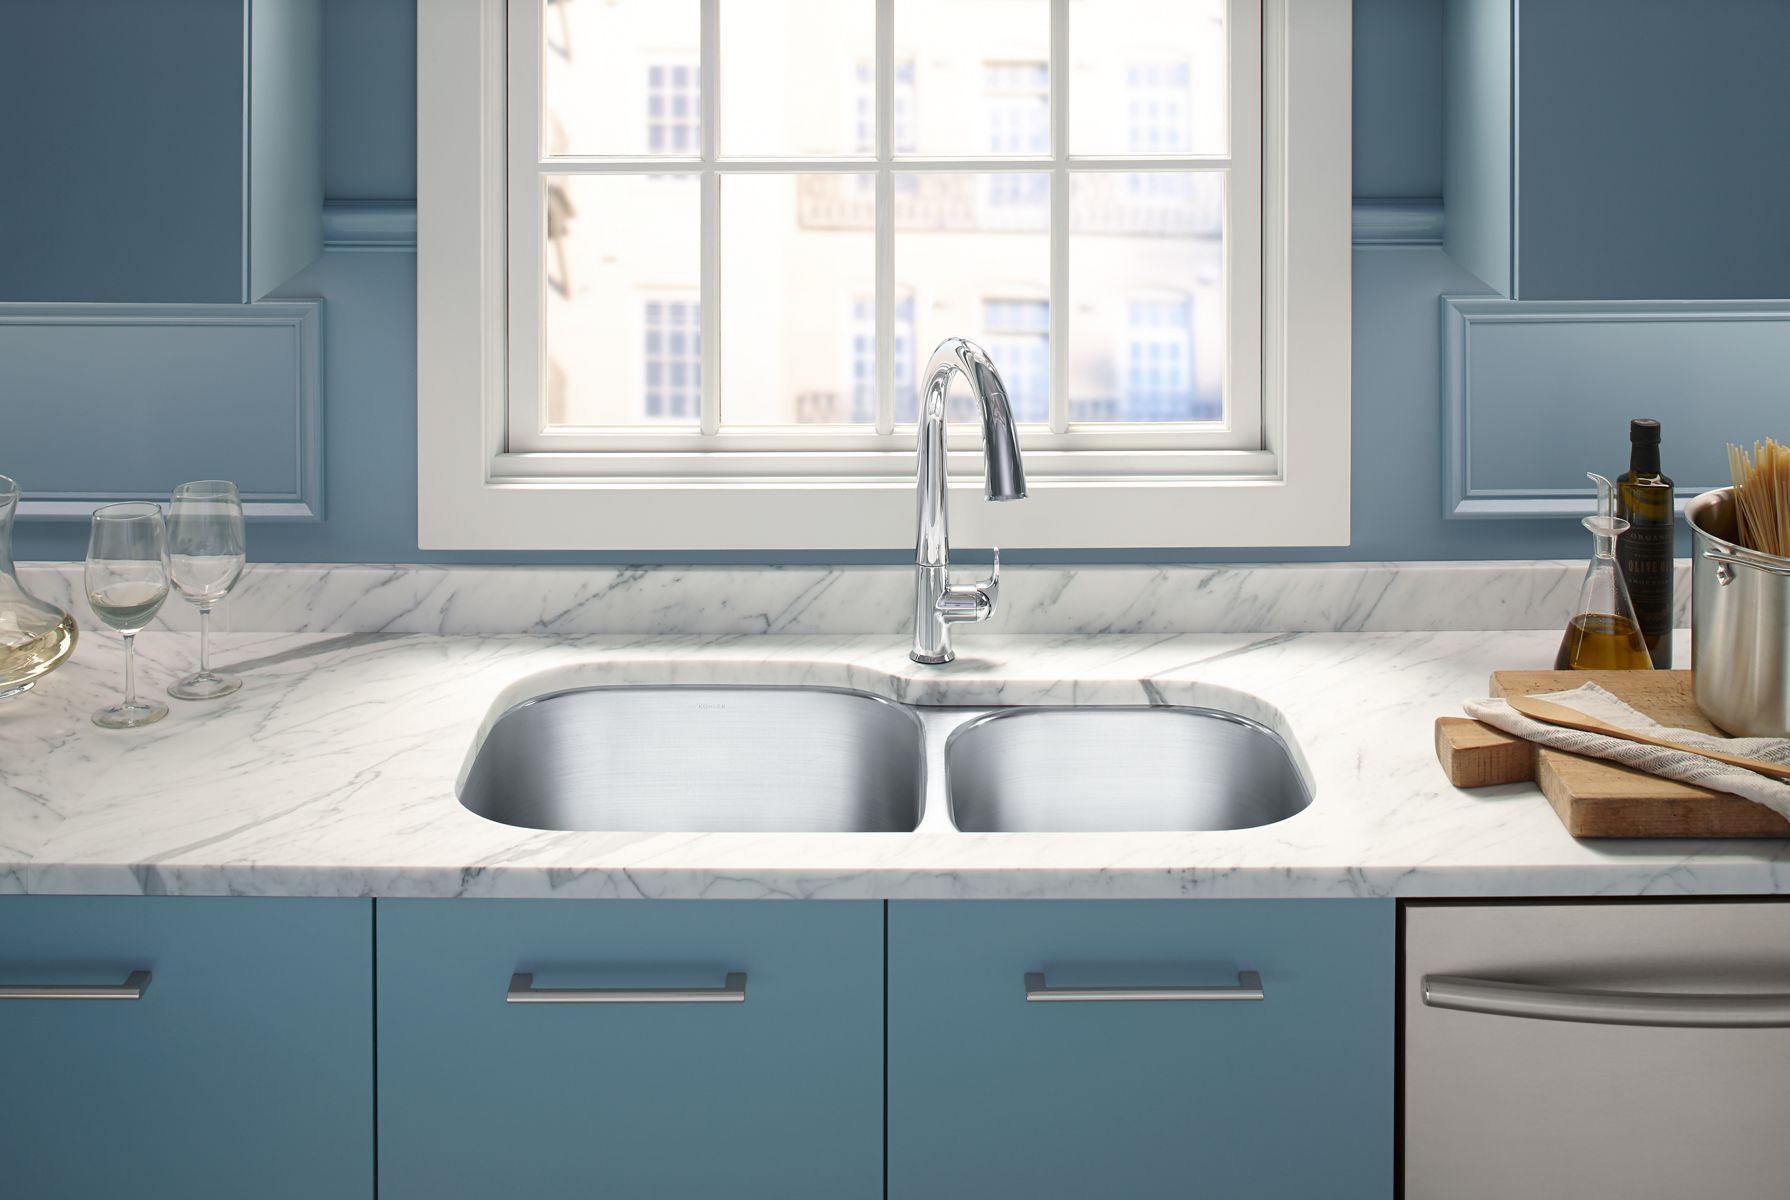 kohler k584610 brookfield cast iron sink